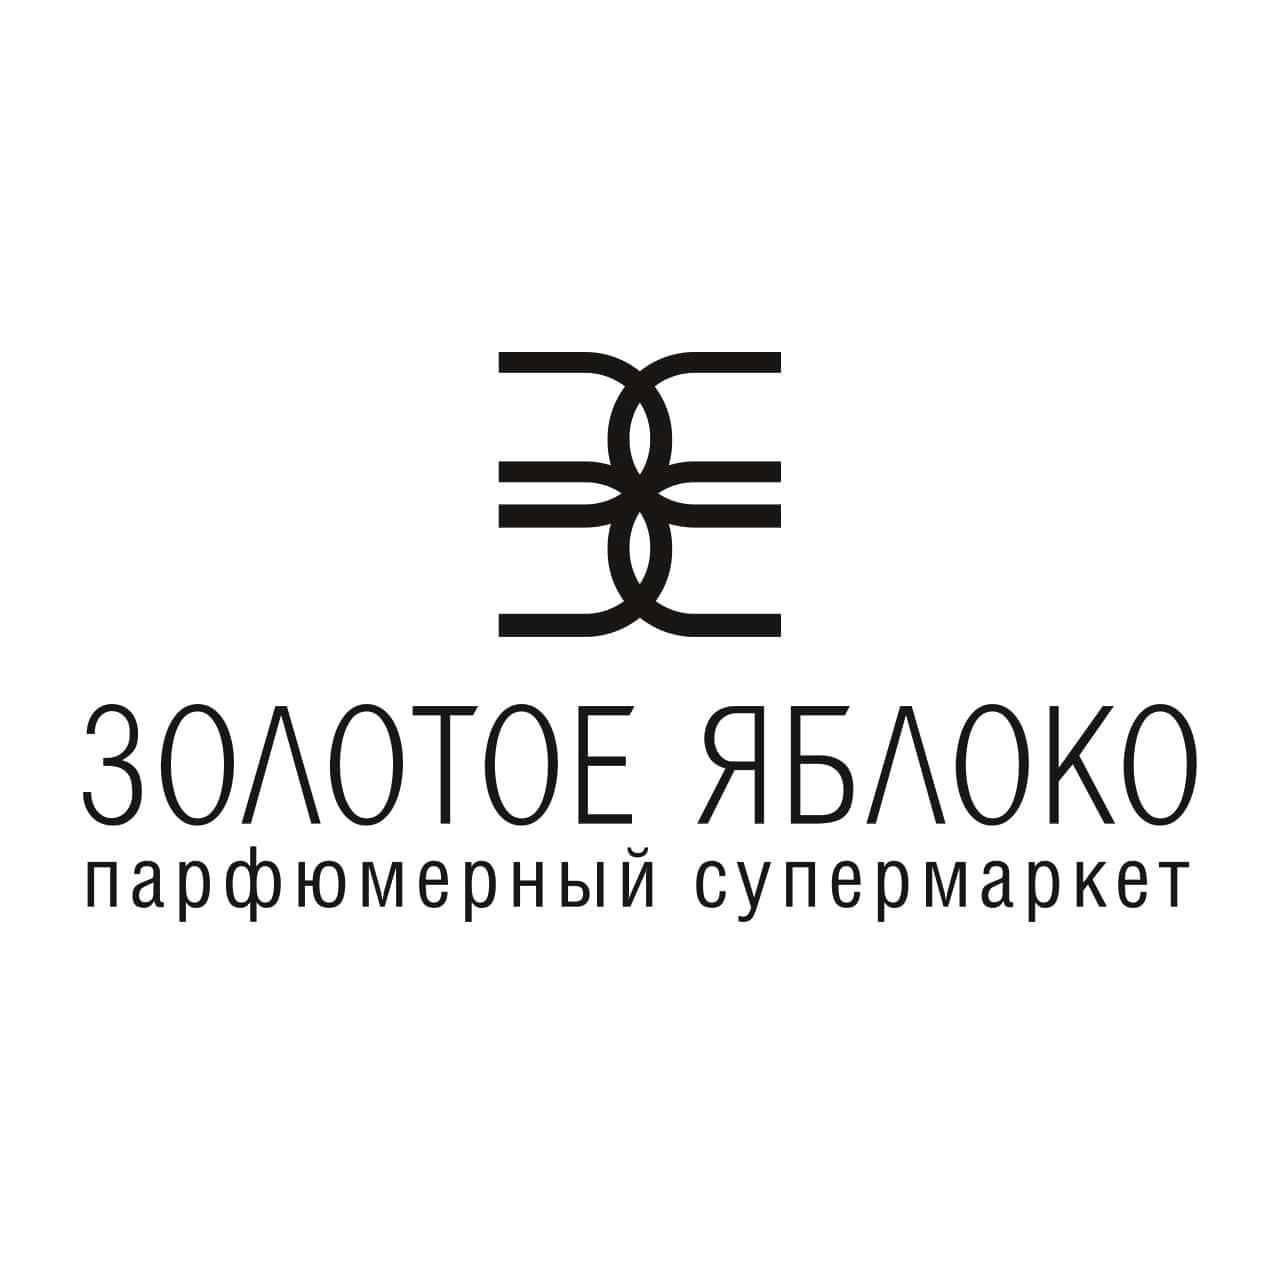 Goldapple Ru Интернет Магазин